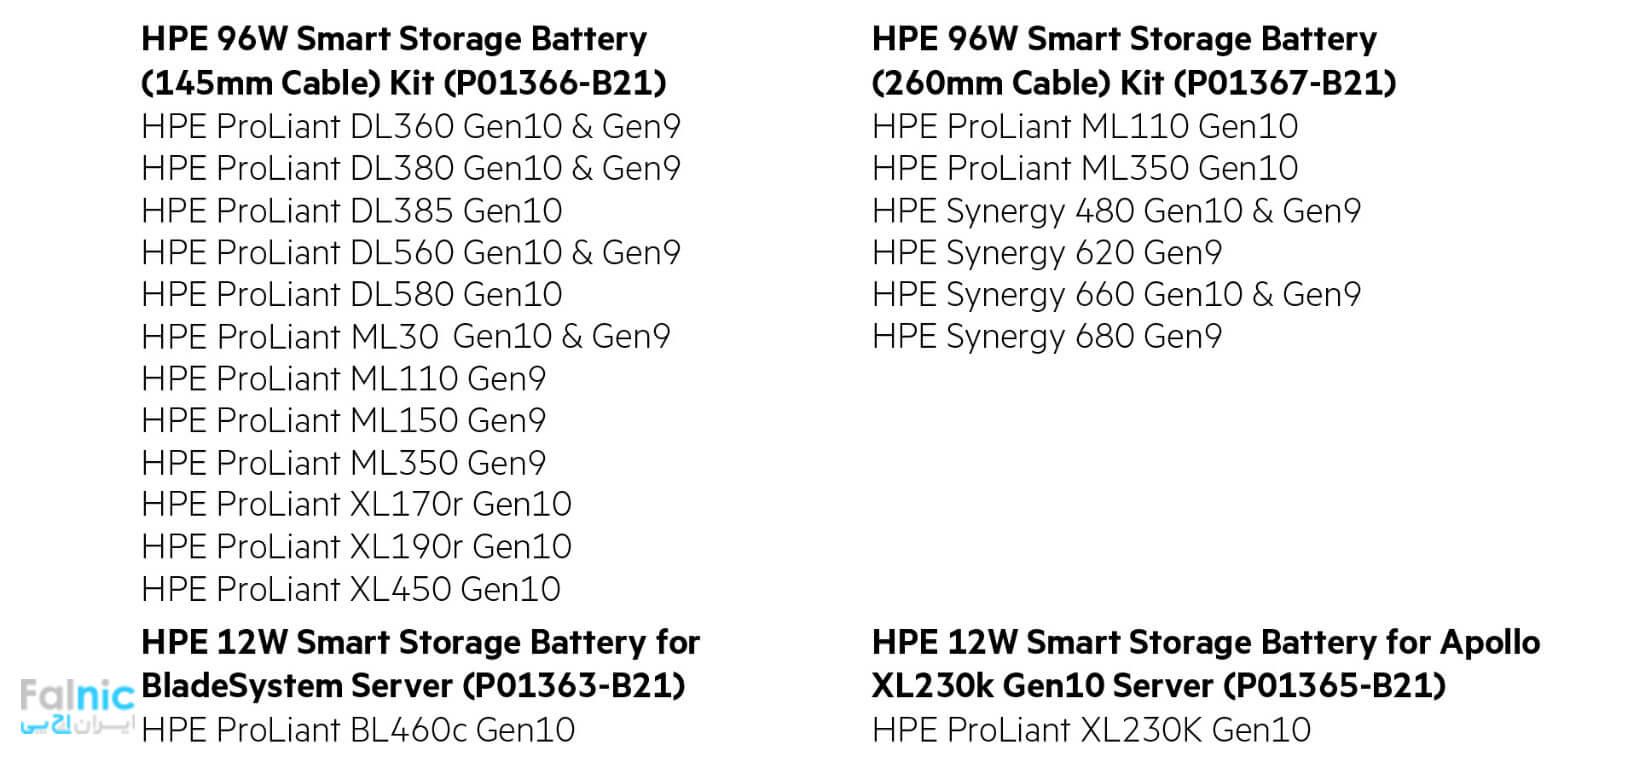 انواع باتری RIAD Controller سرور اچ پی